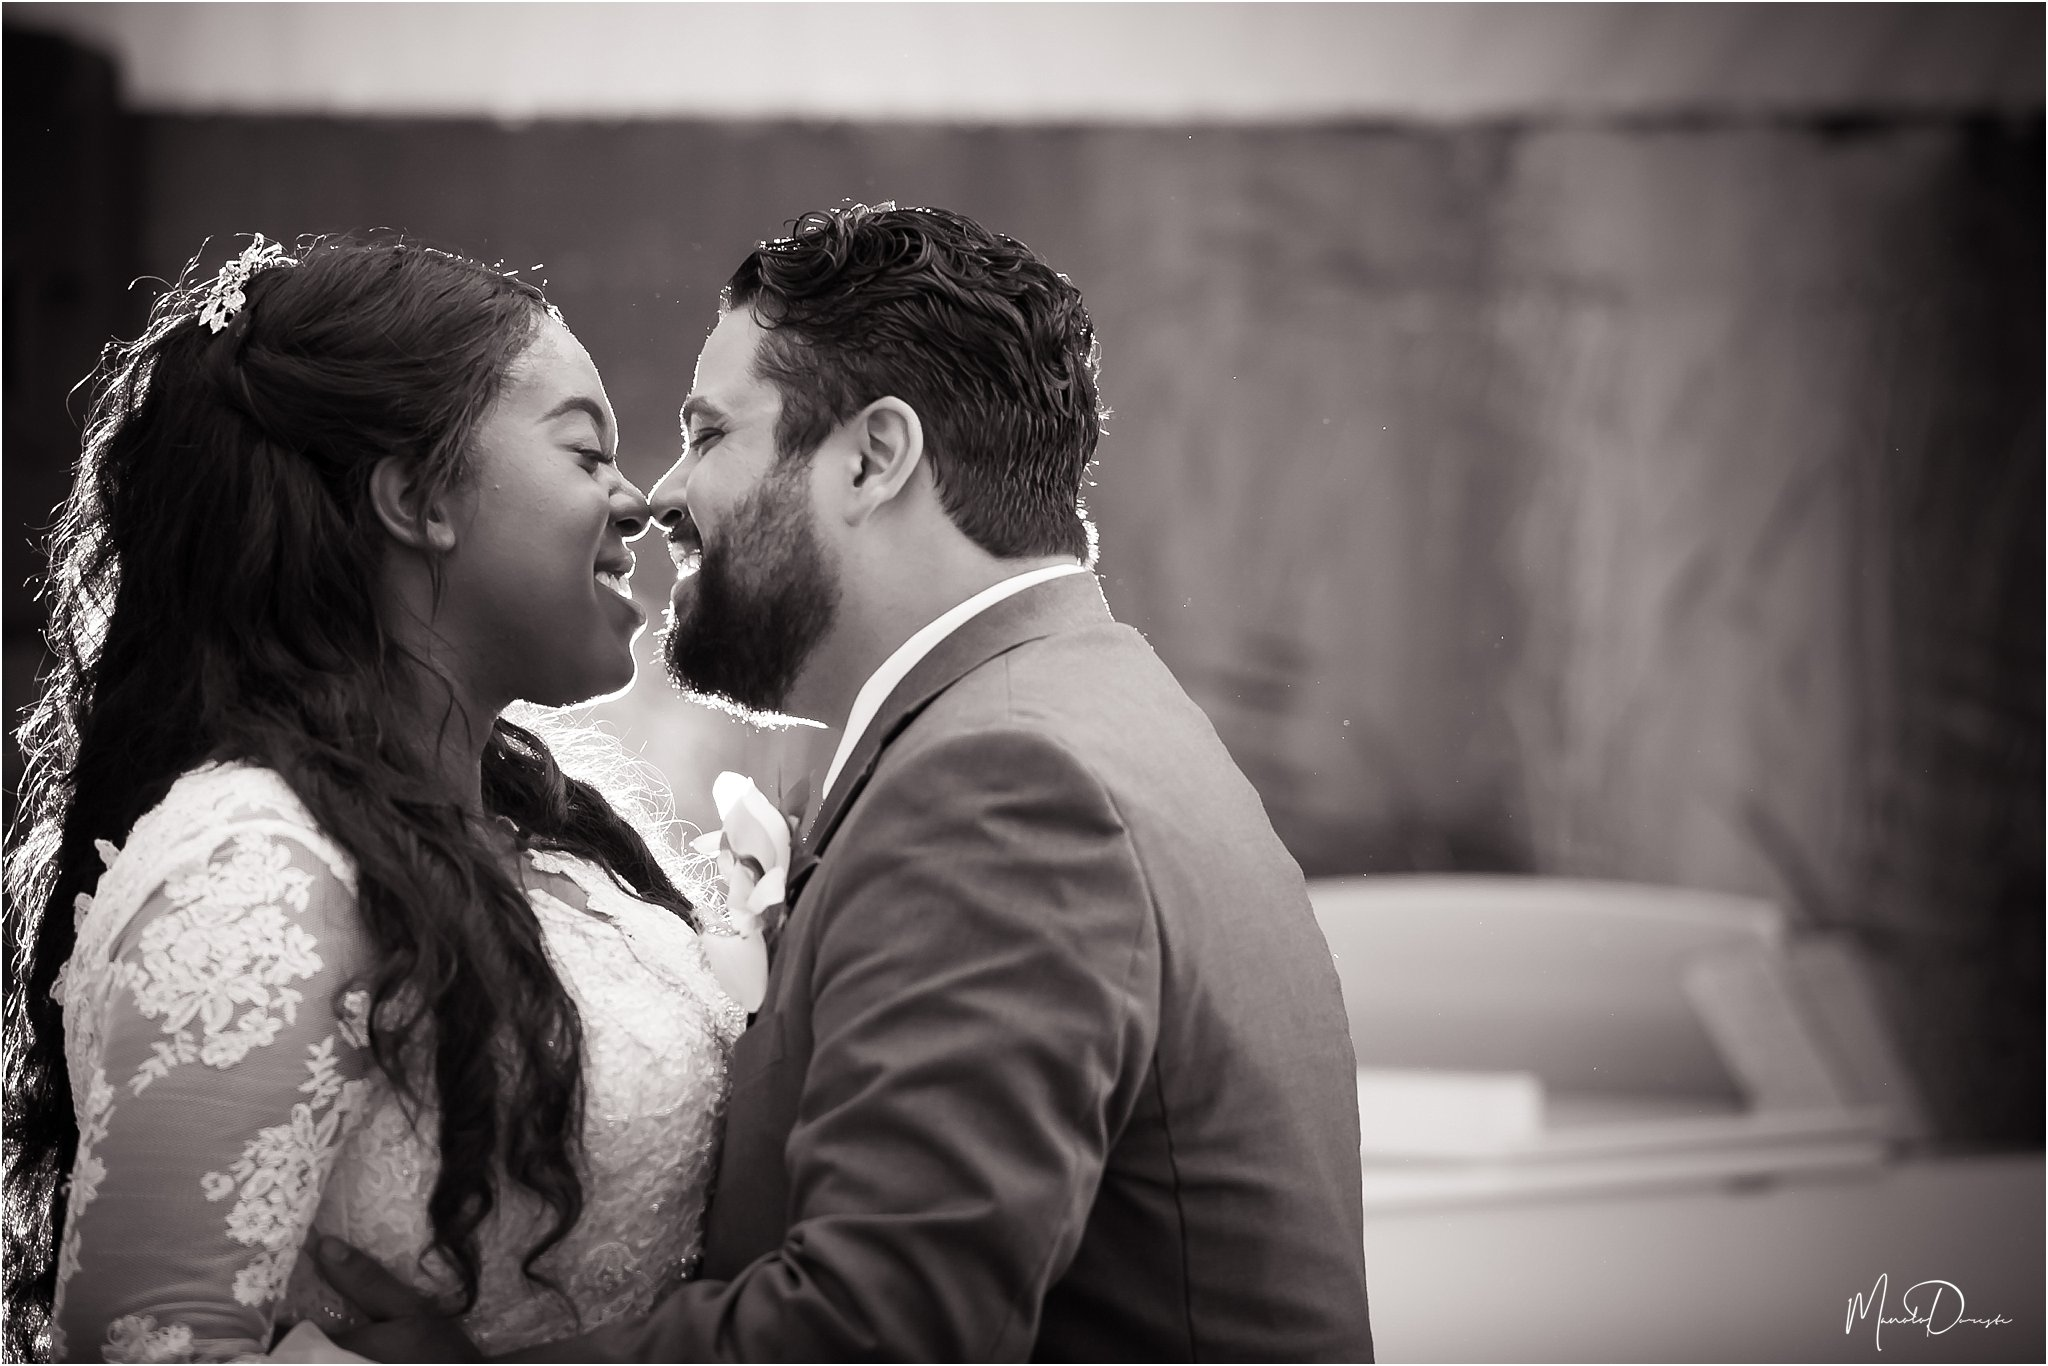 0429_ManoloDoreste_InFocusStudios_Wedding_Family_Photography_Miami_MiamiPhotographer.jpg